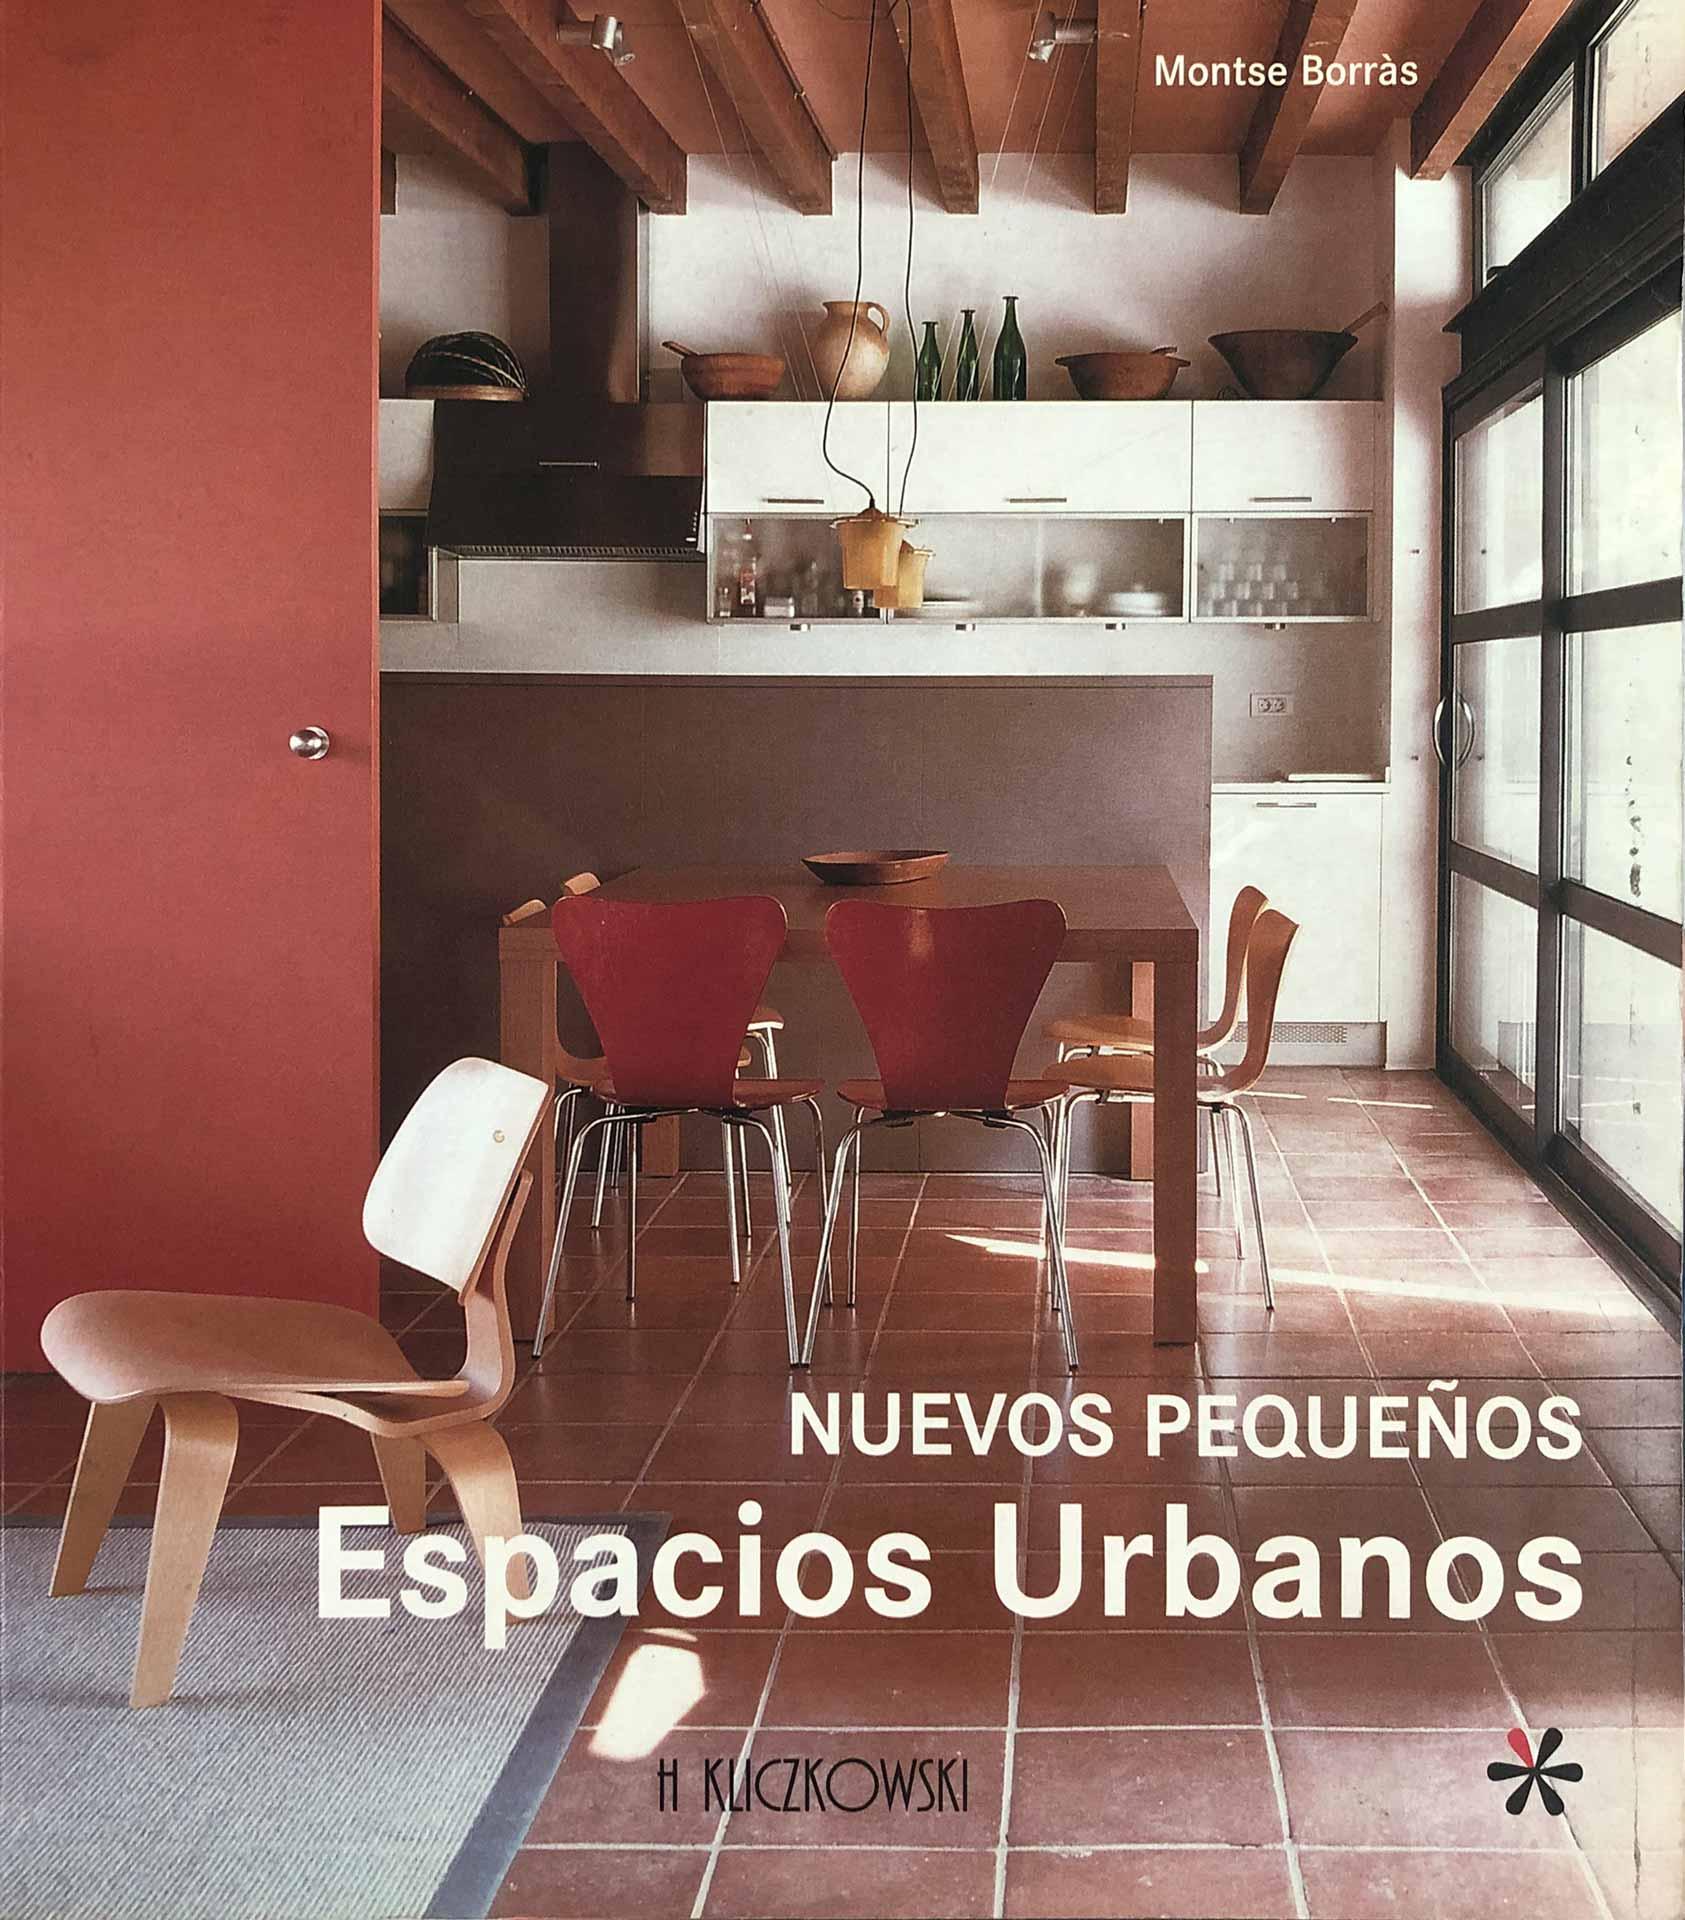 Sucursal Urbana en libros monográficos sobre arquitectura